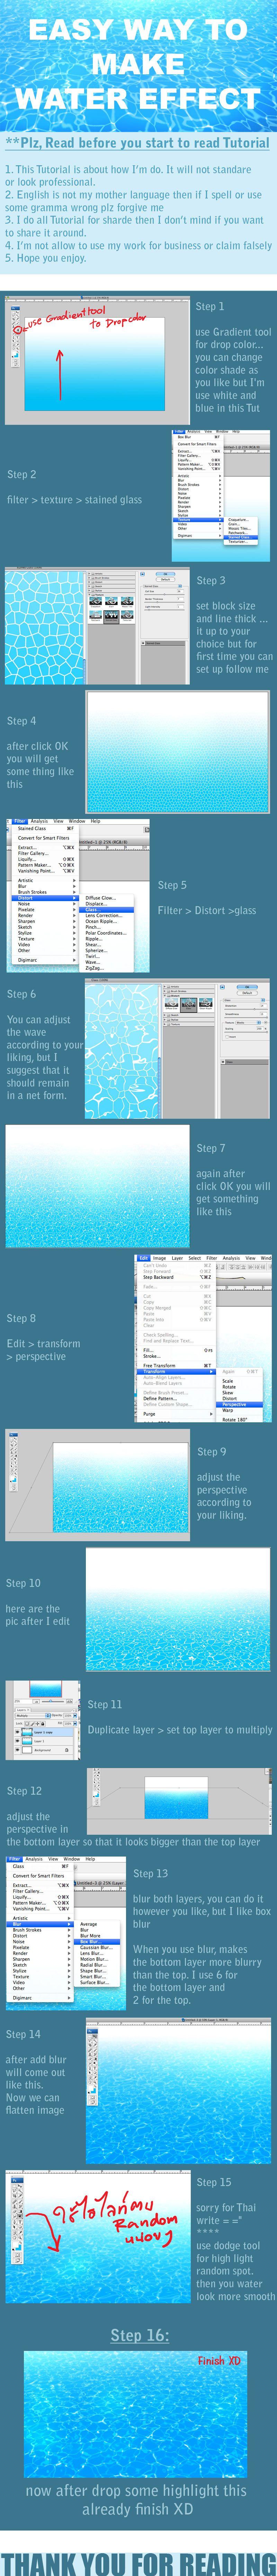 Easy way to make water -3- by =pandabaka on deviantART